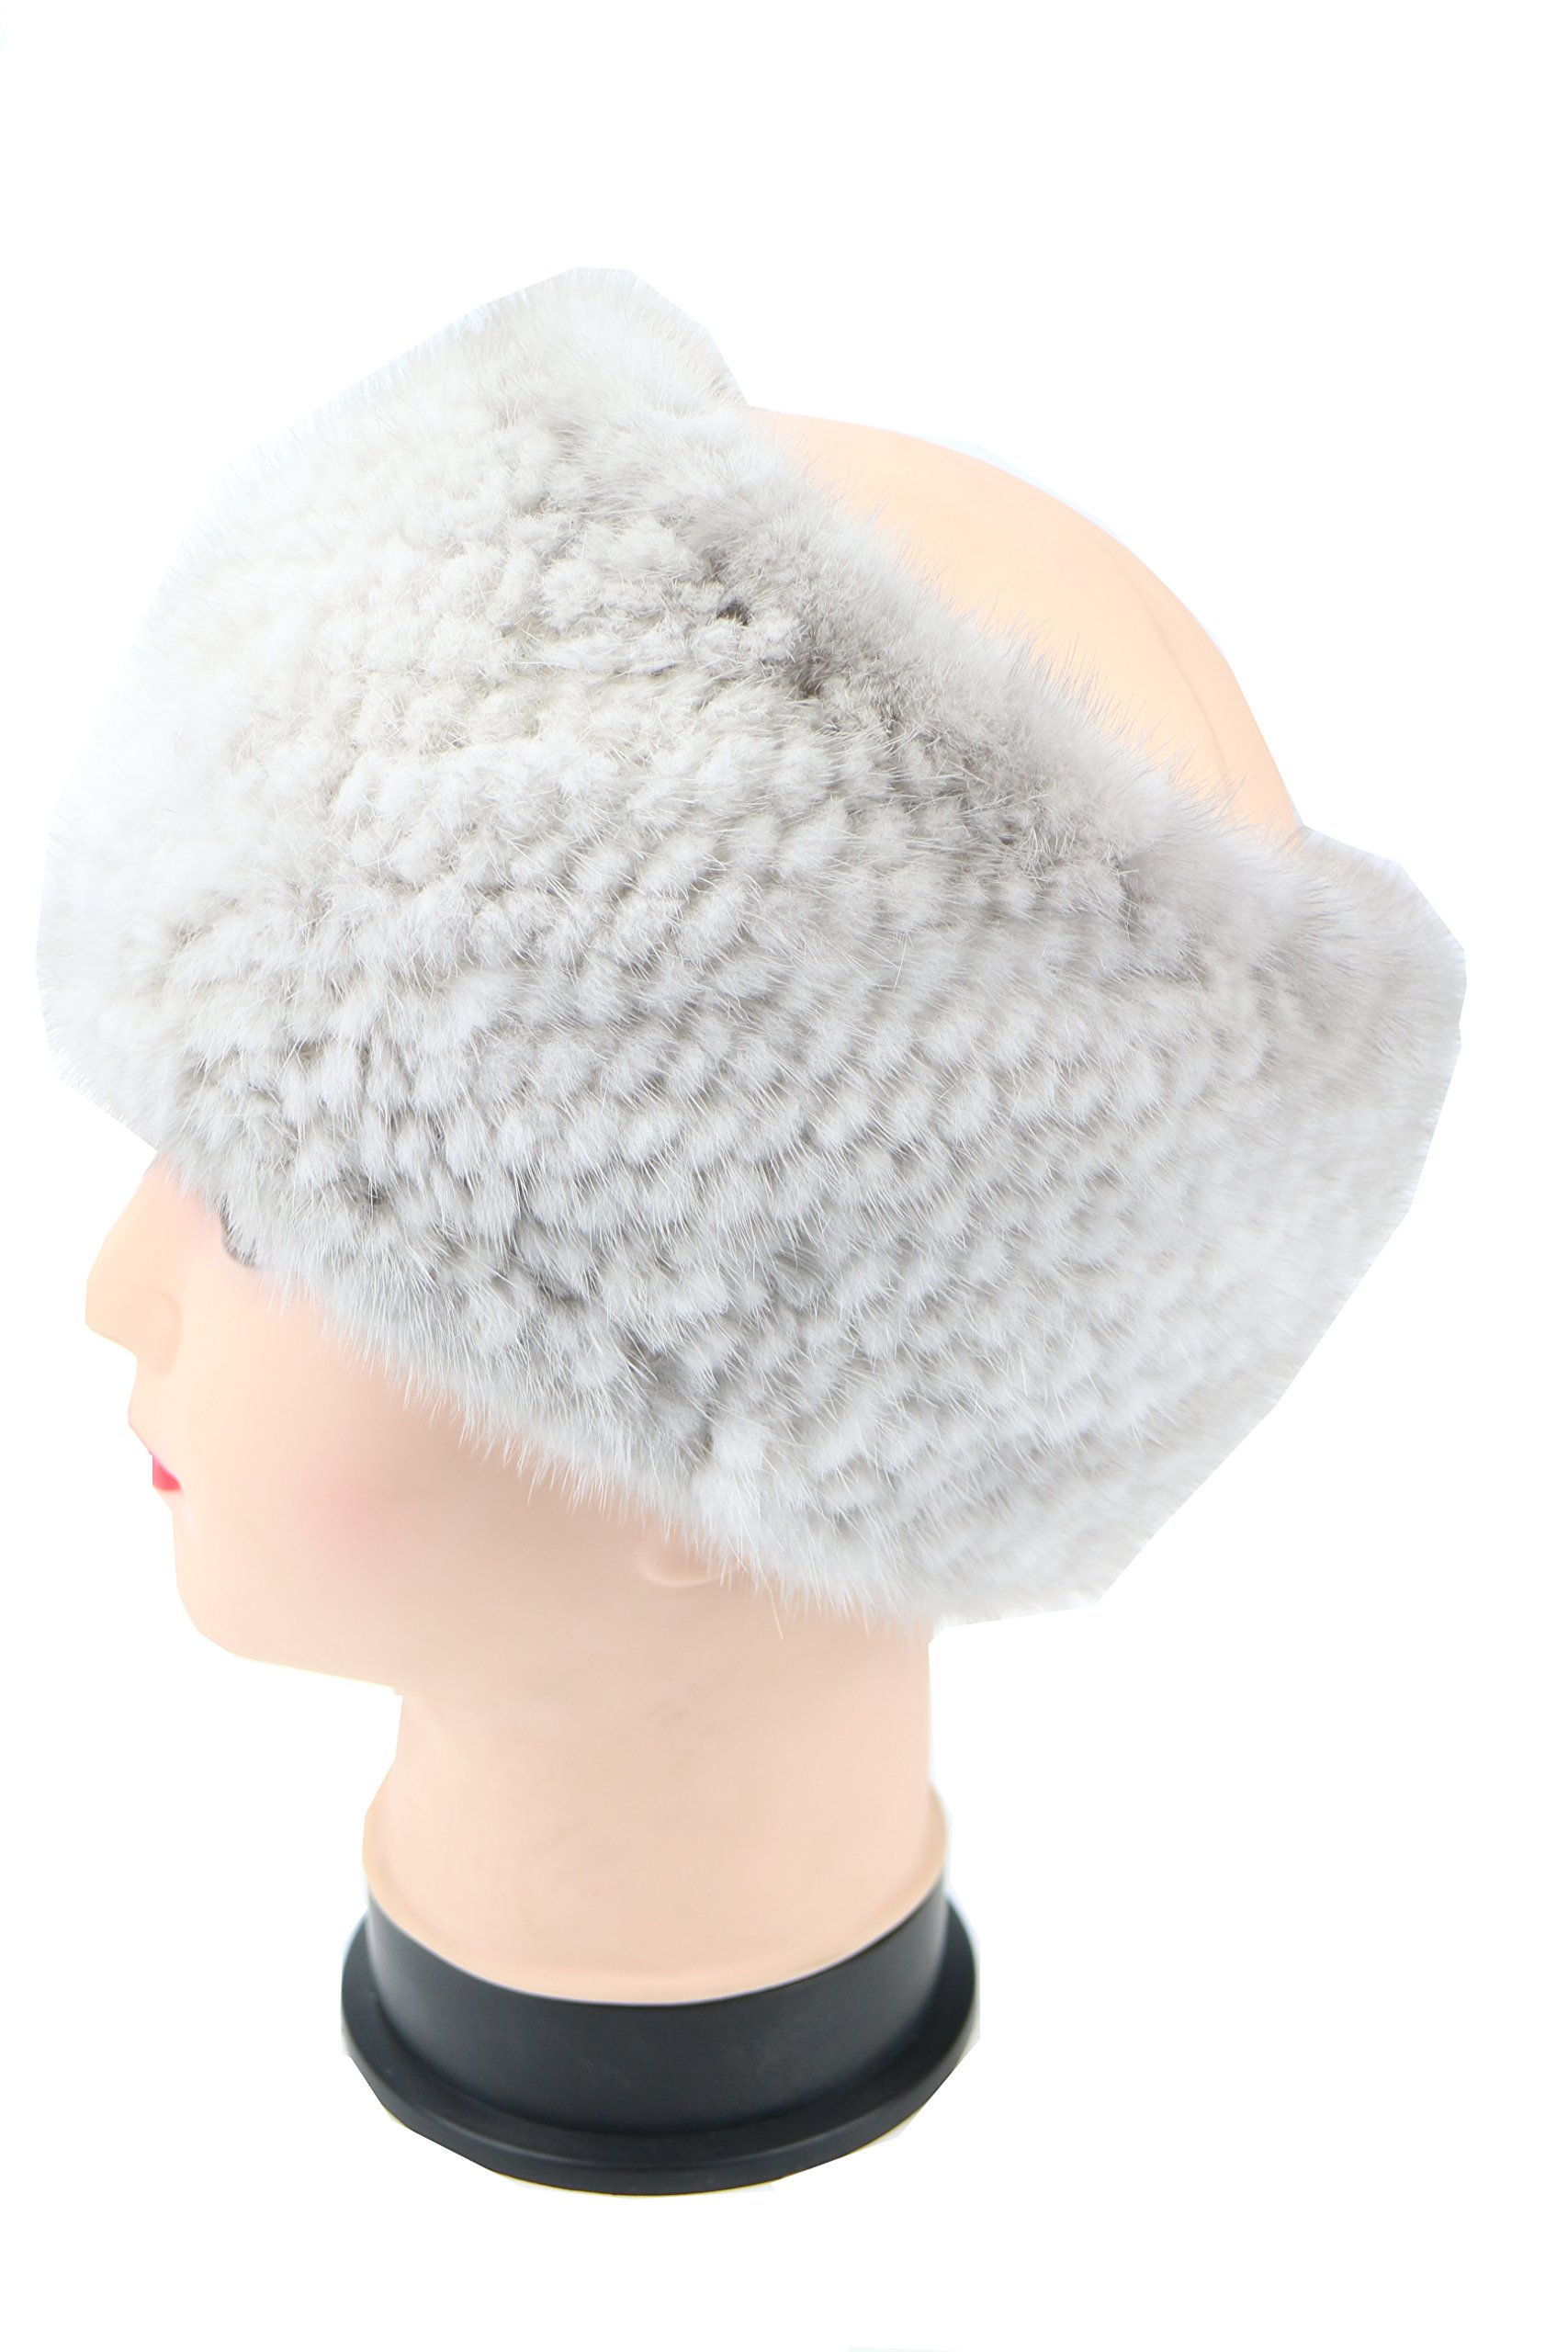 Ysting Women Tight Knitted Mink Fur Headband Neck Warmer Warp Snood Mink Fur Hat (G)